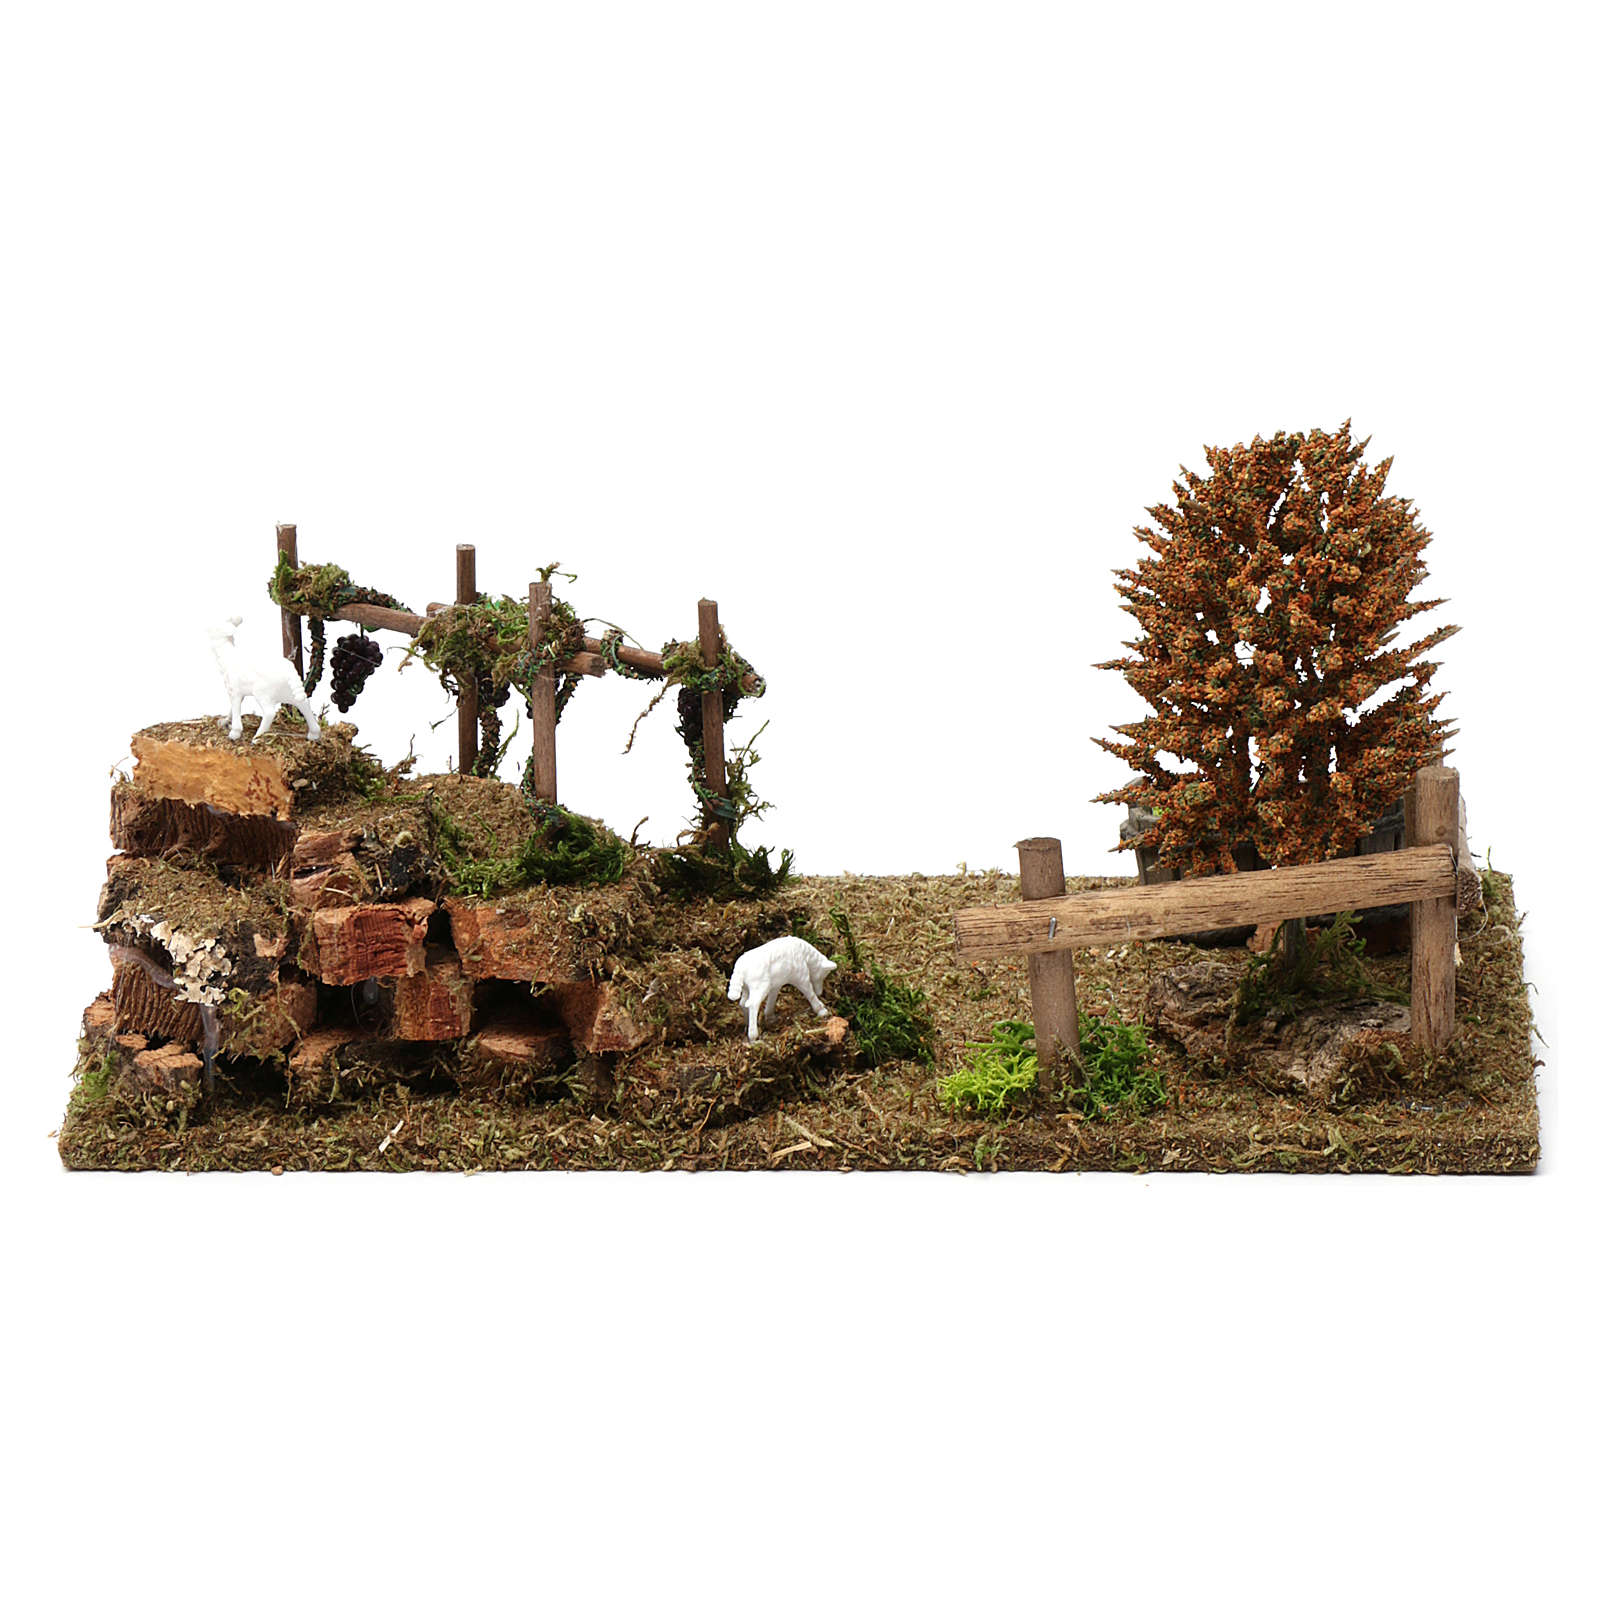 Vineyars 8-10 cm, Nativity Scene setting 10x30x20 4